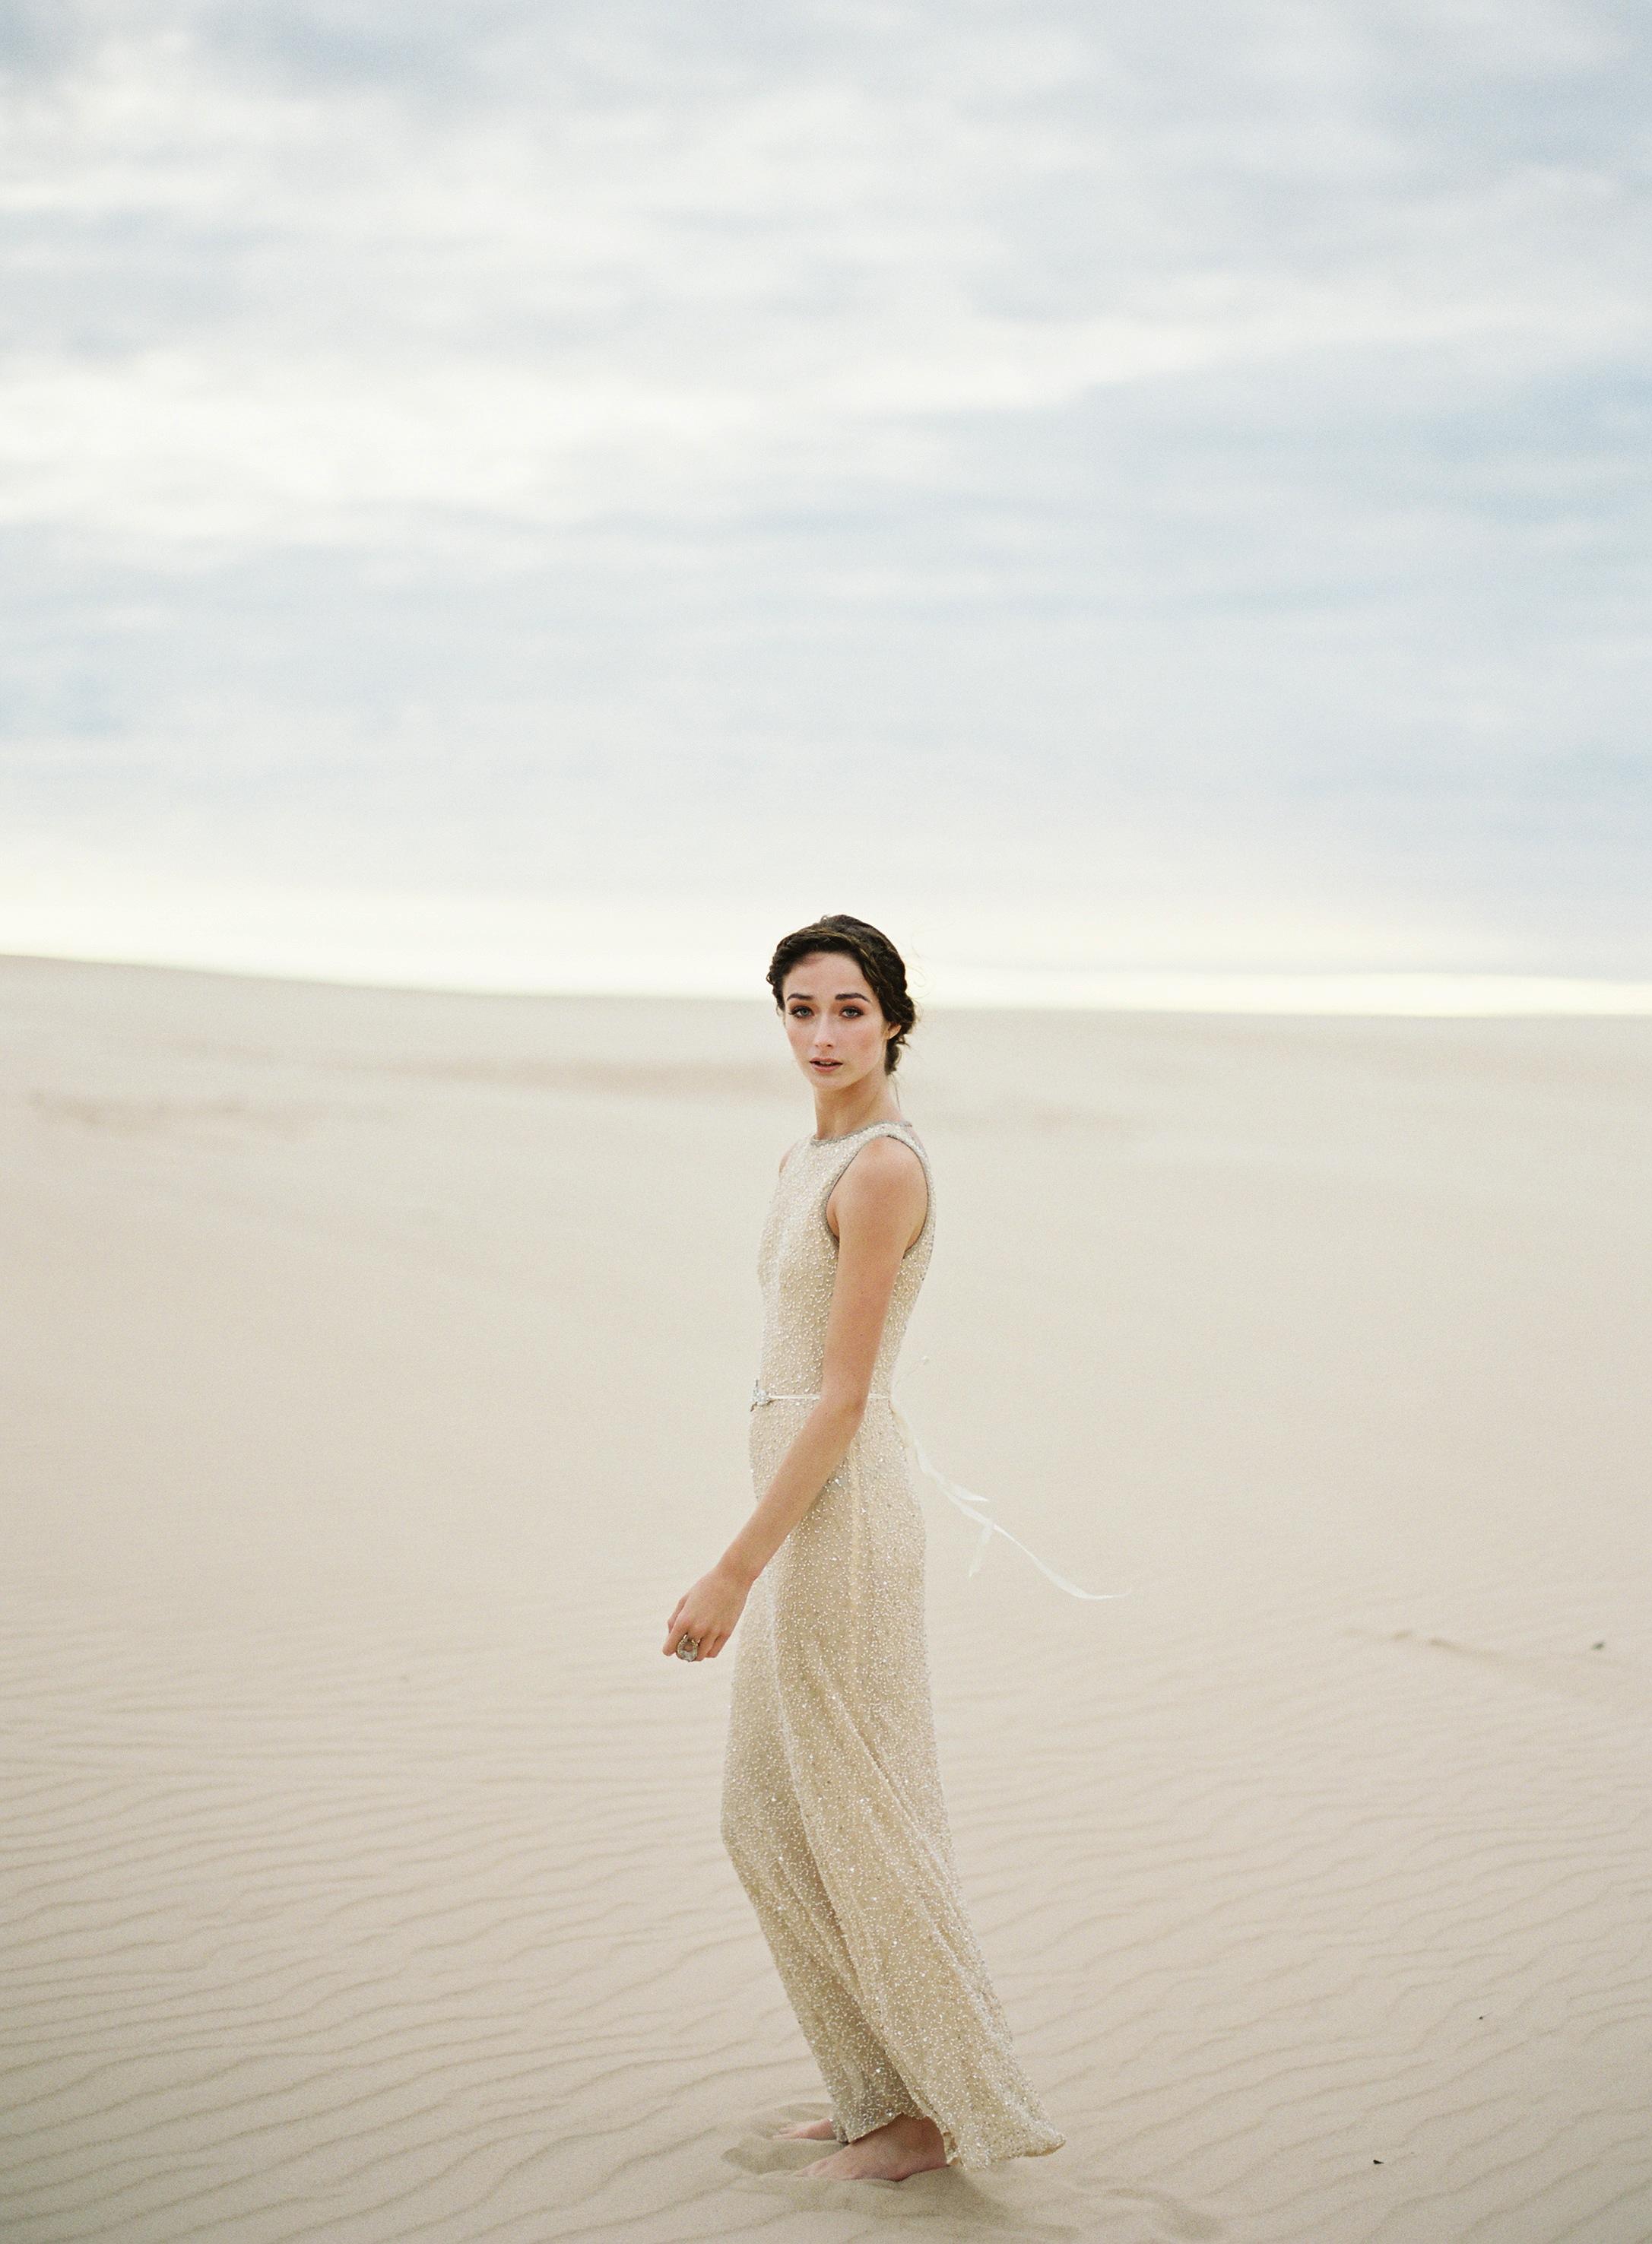 Kyle John l Fine Art Wedding Photography l Chicago, Copenhagen, California, New York, Destination l Blog l Millicent_12